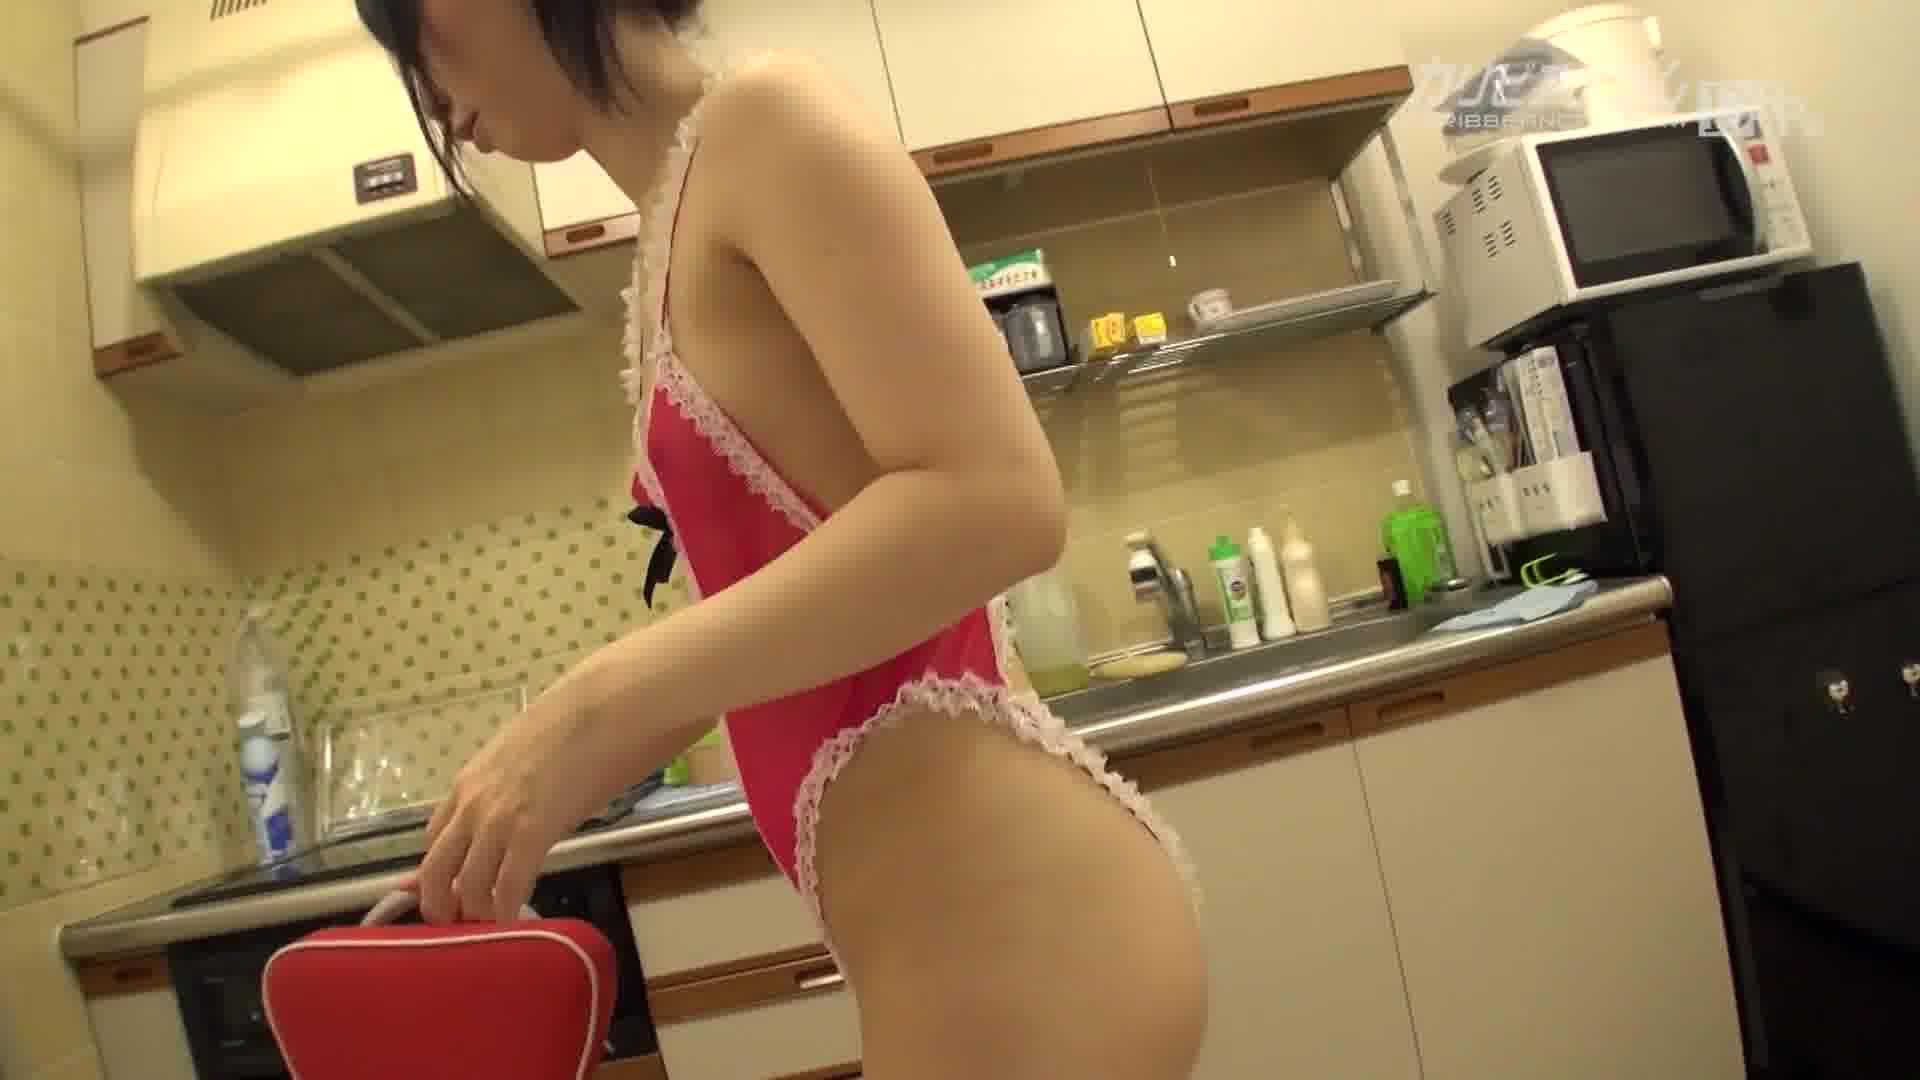 AV女優をあなたの自宅に宅配!3 - おぐりみく【痴女・パイパン・中出し】